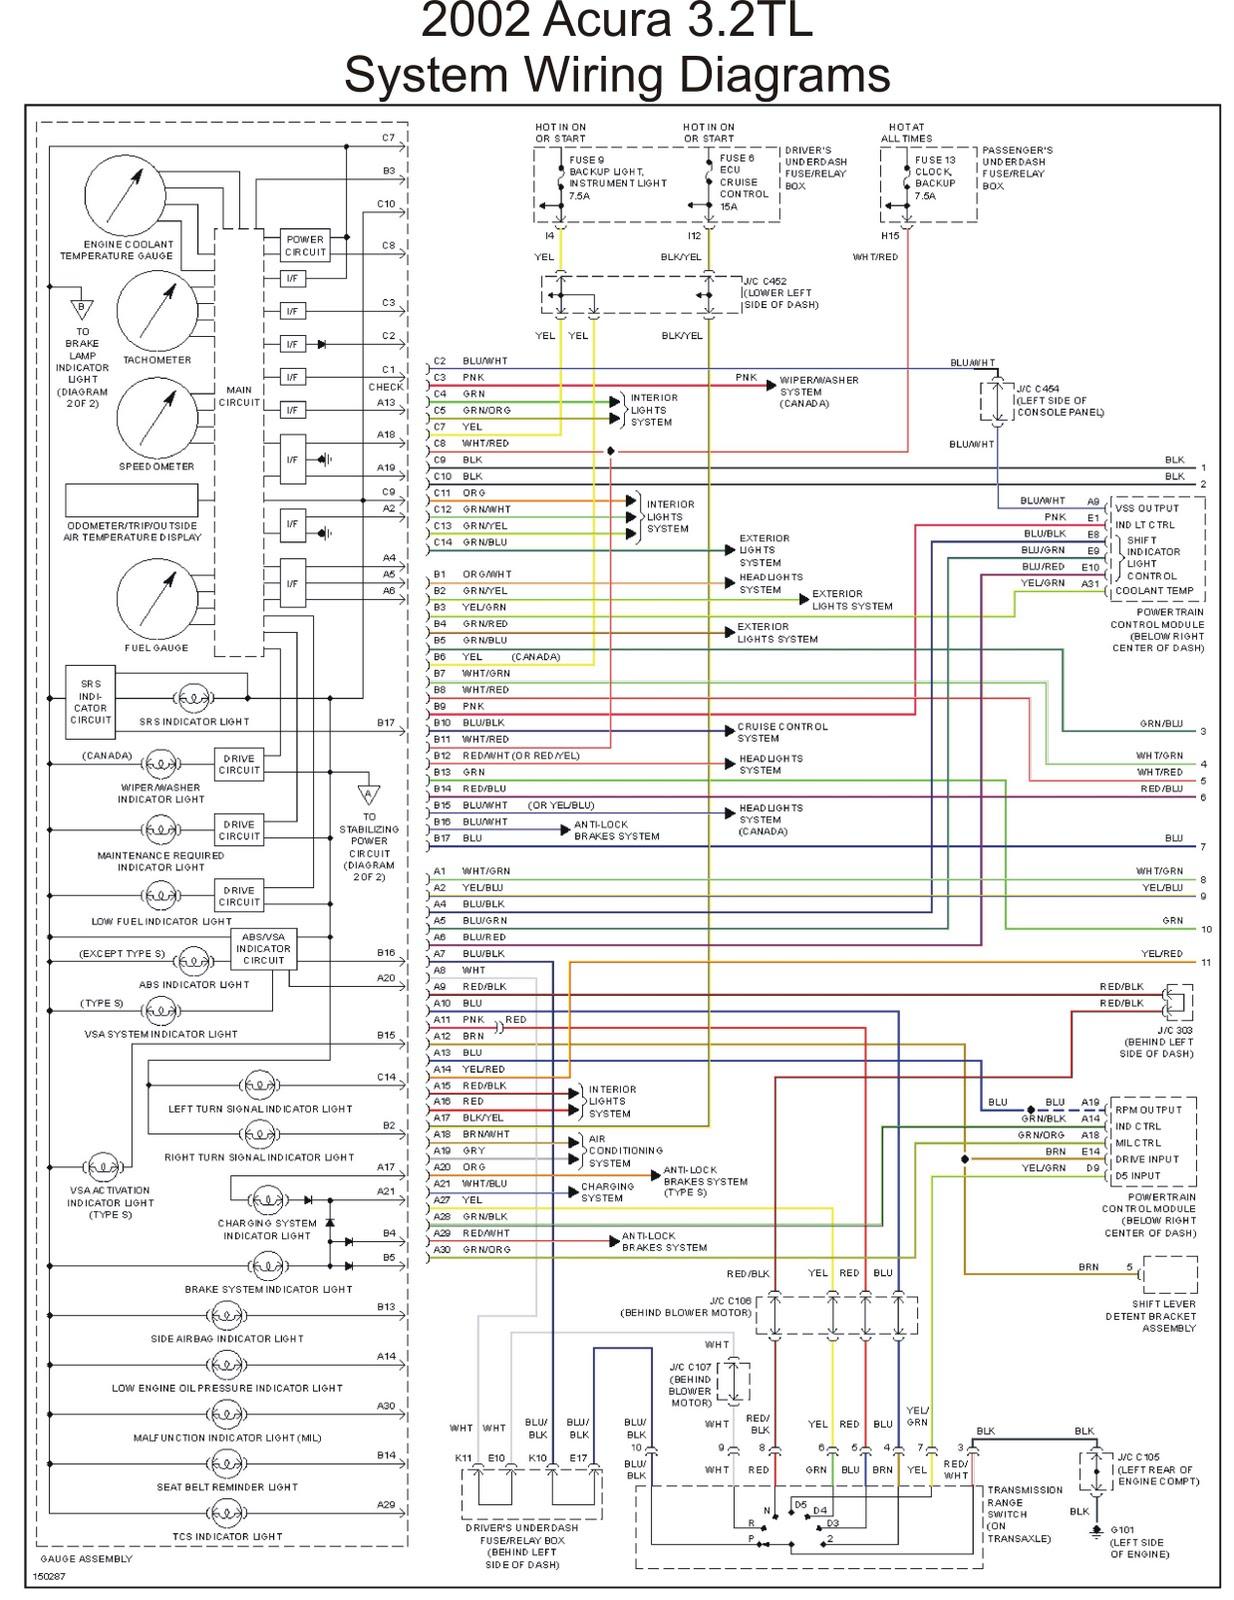 Silverado Radio Wiring Diagram Additionally Klr 650 Wiring Diagram